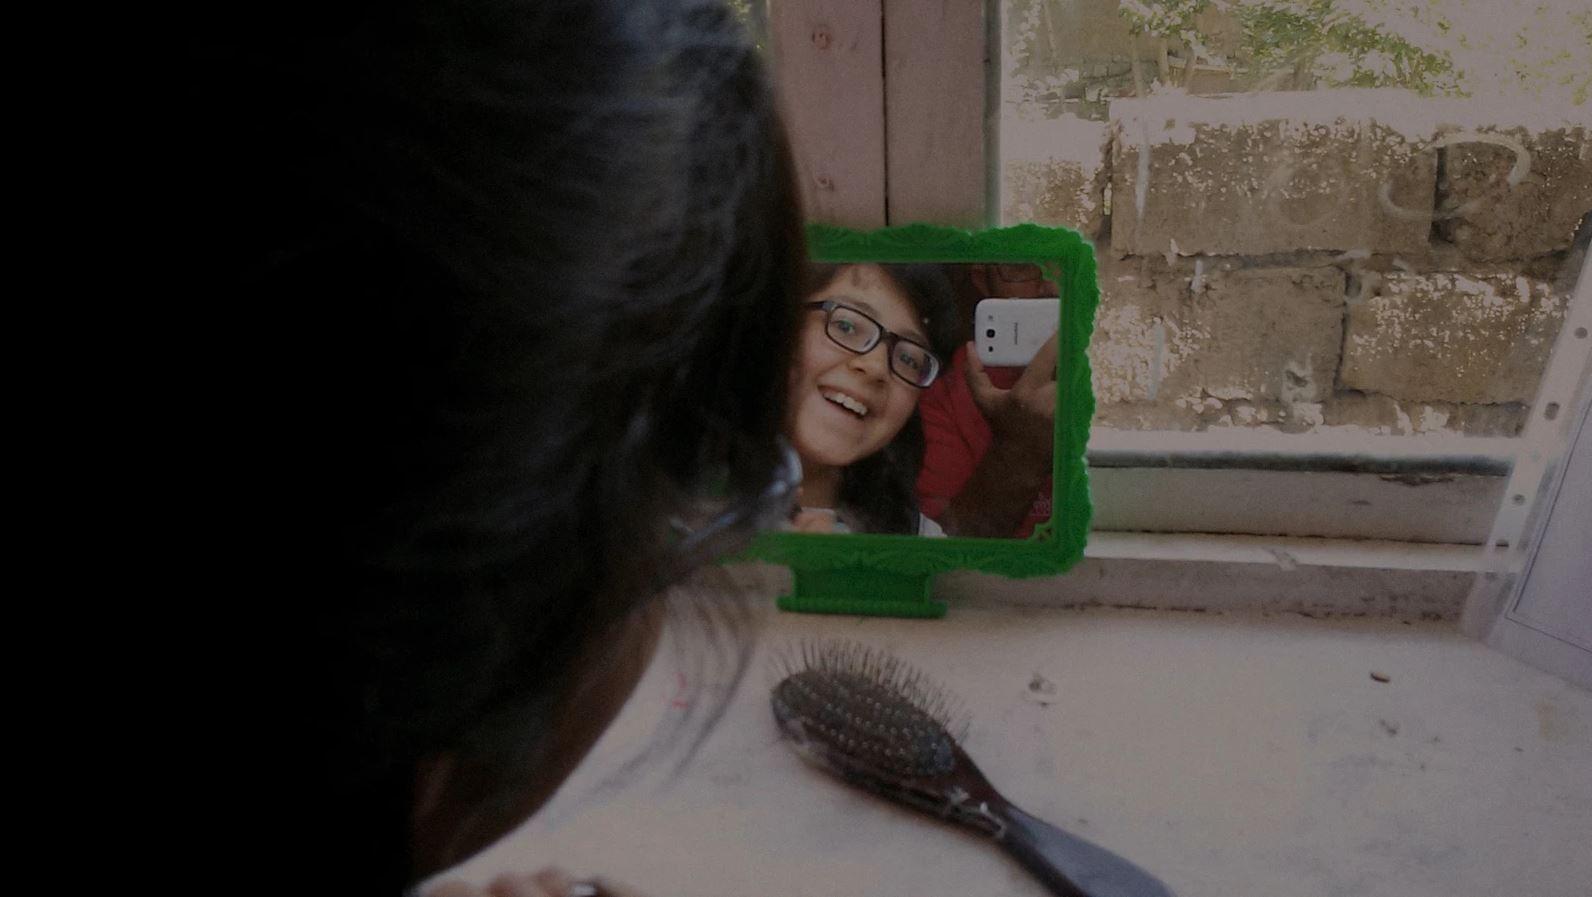 Midnight Traveler (BANDE-ANNONCE) Documentaire de Hassan Fazili - Le 30 juin 2021 au cinéma